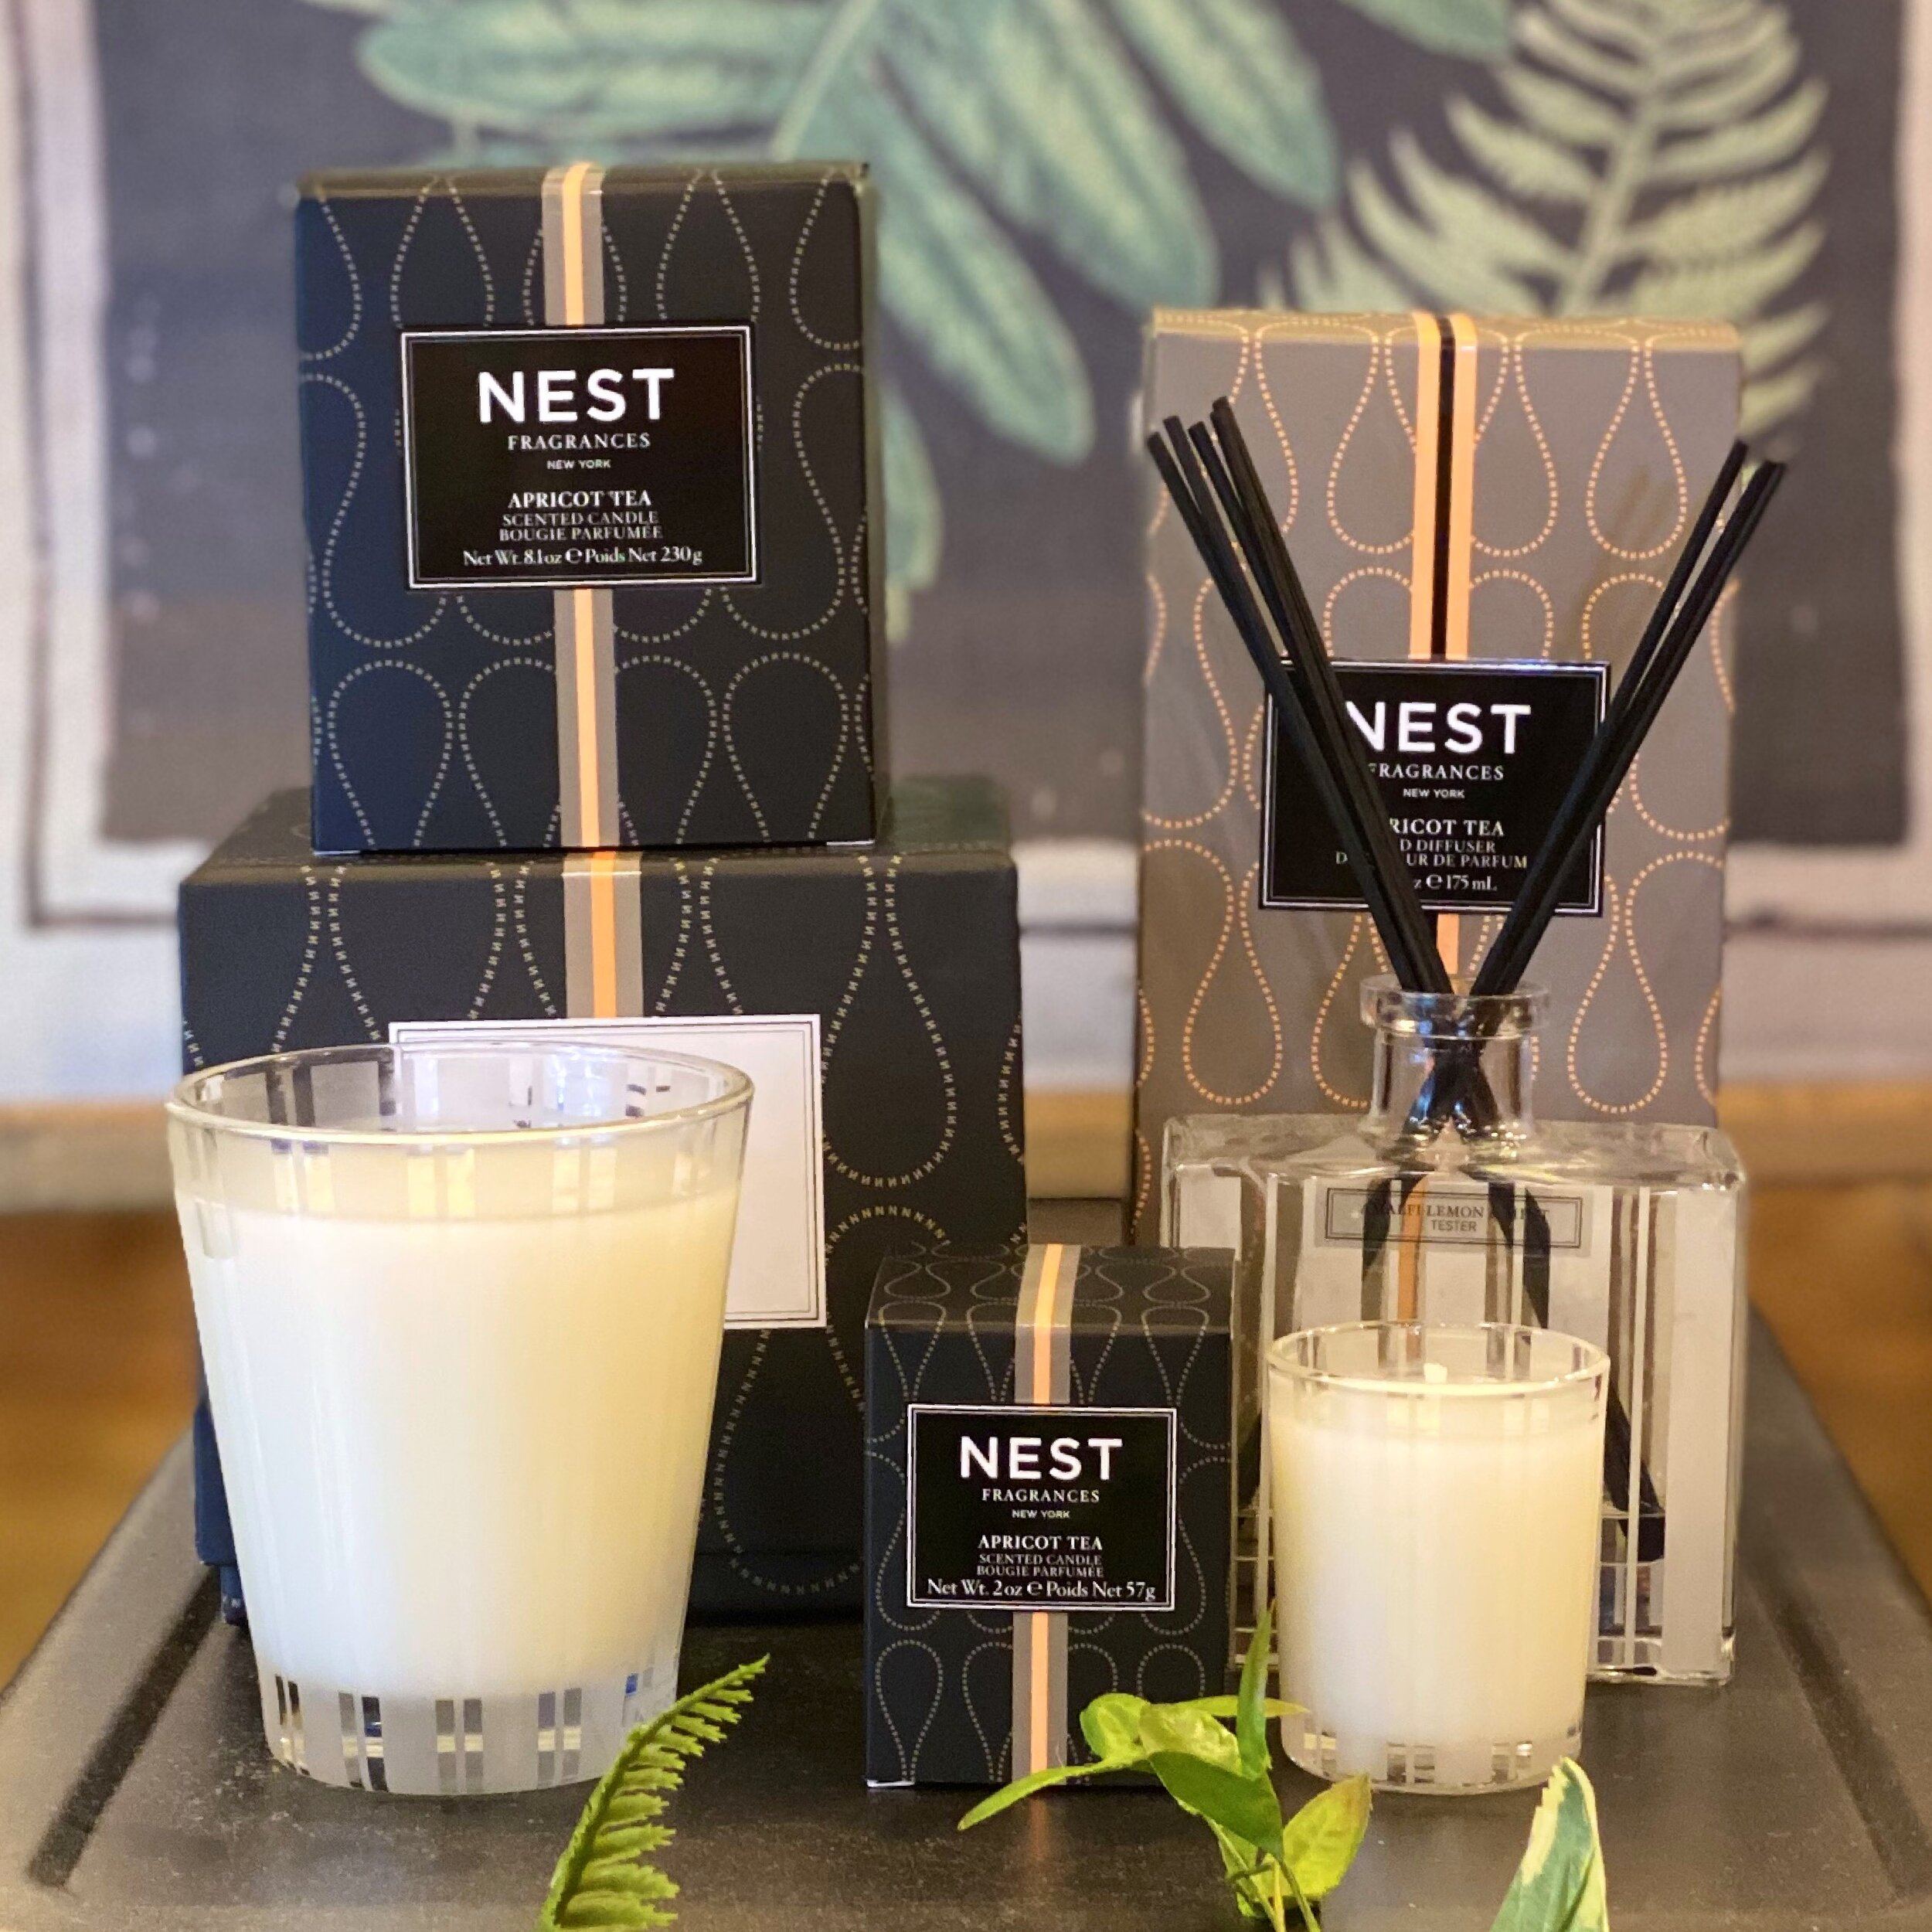 Nest Apricot Tea.JPG